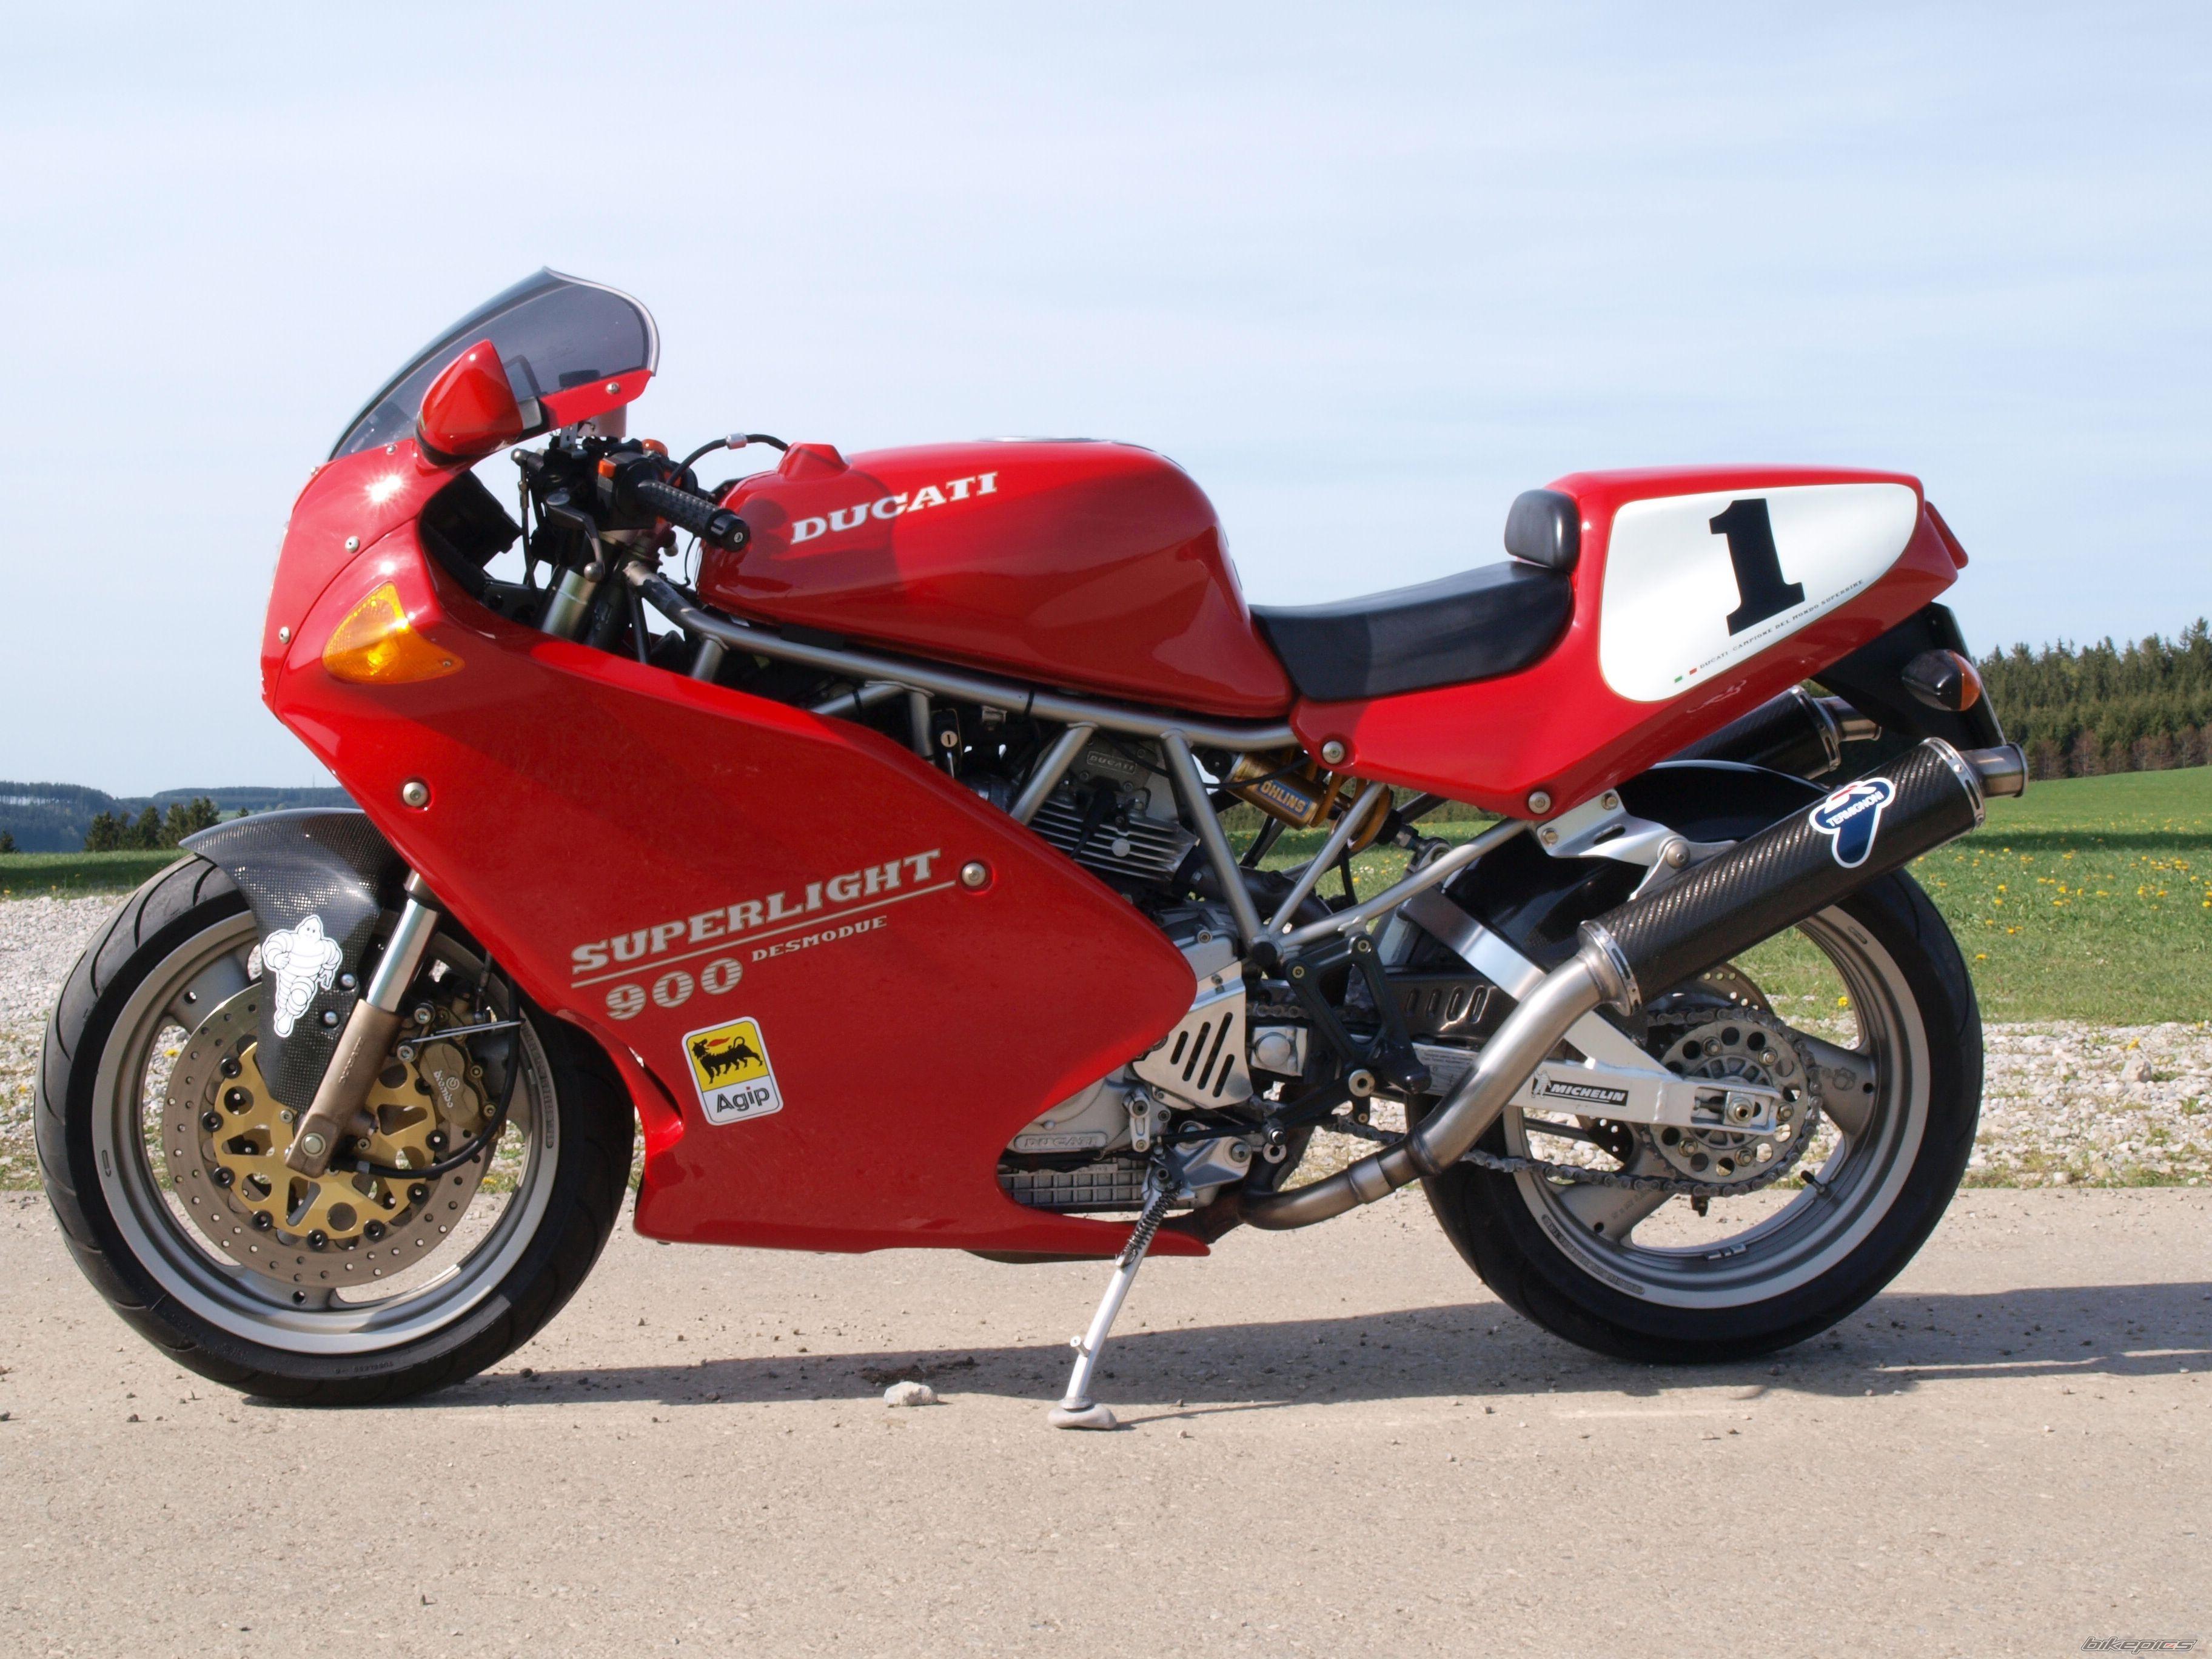 1995-ducati-900-superlight-series-motorsport   moto   Pinterest ...